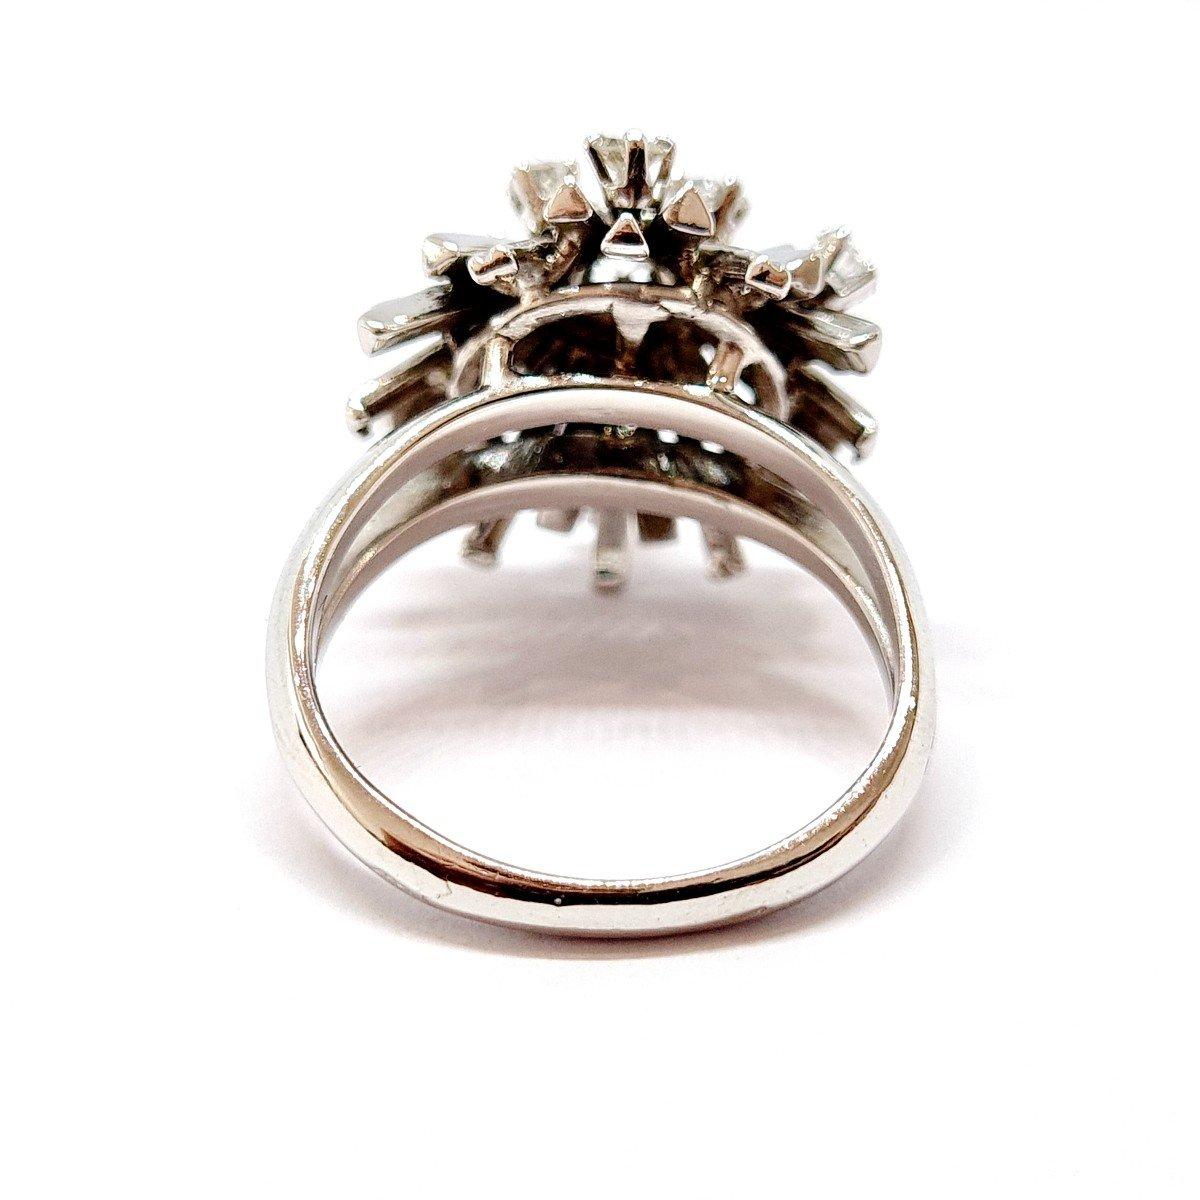 Bague Ancienne Or Blanc 18 Carats Diamants-photo-3